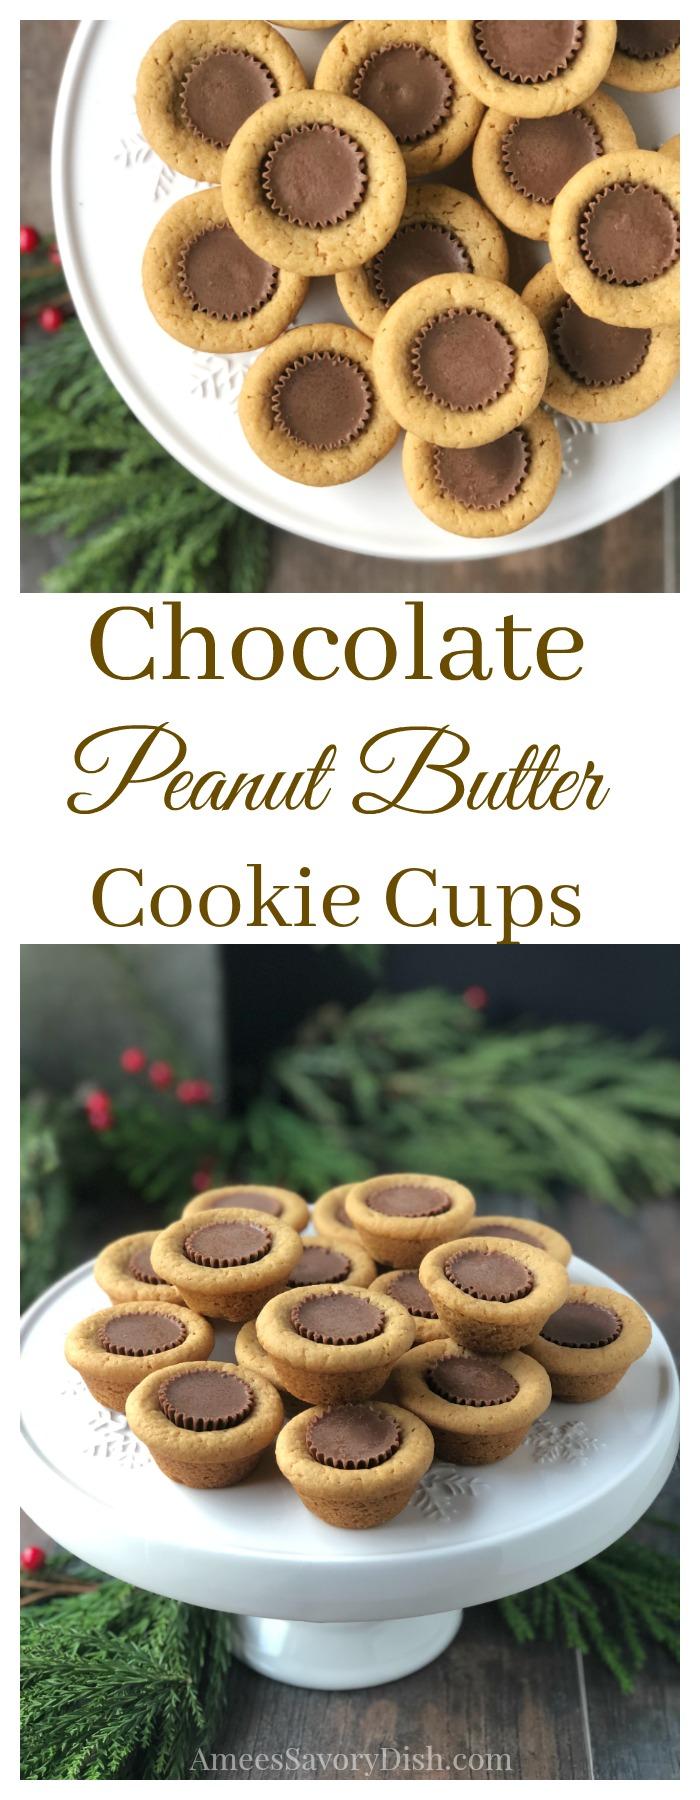 Chocolate Peanut Butter Cookie Cups recipe #chocolate #peanutbutter #peanutbuttercookie #holidaybaking #holidaycookierecipe #cookies #cookierecipe via @Ameessavorydish